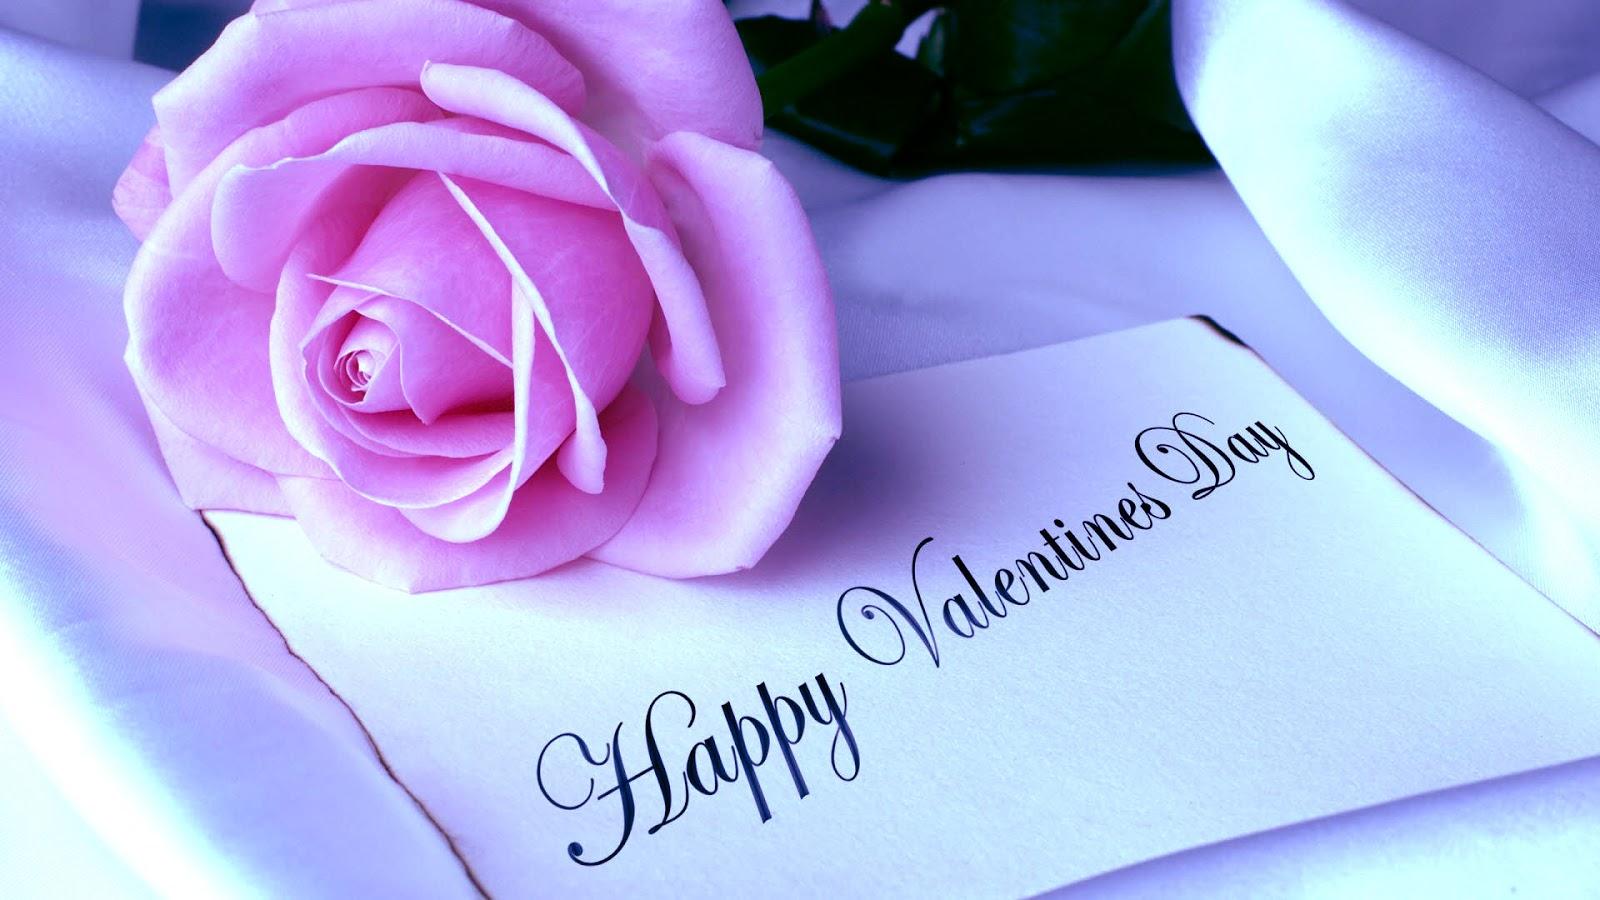 Kumpulan Kuote Ucapan Valentine Days Paling Romantis 2018